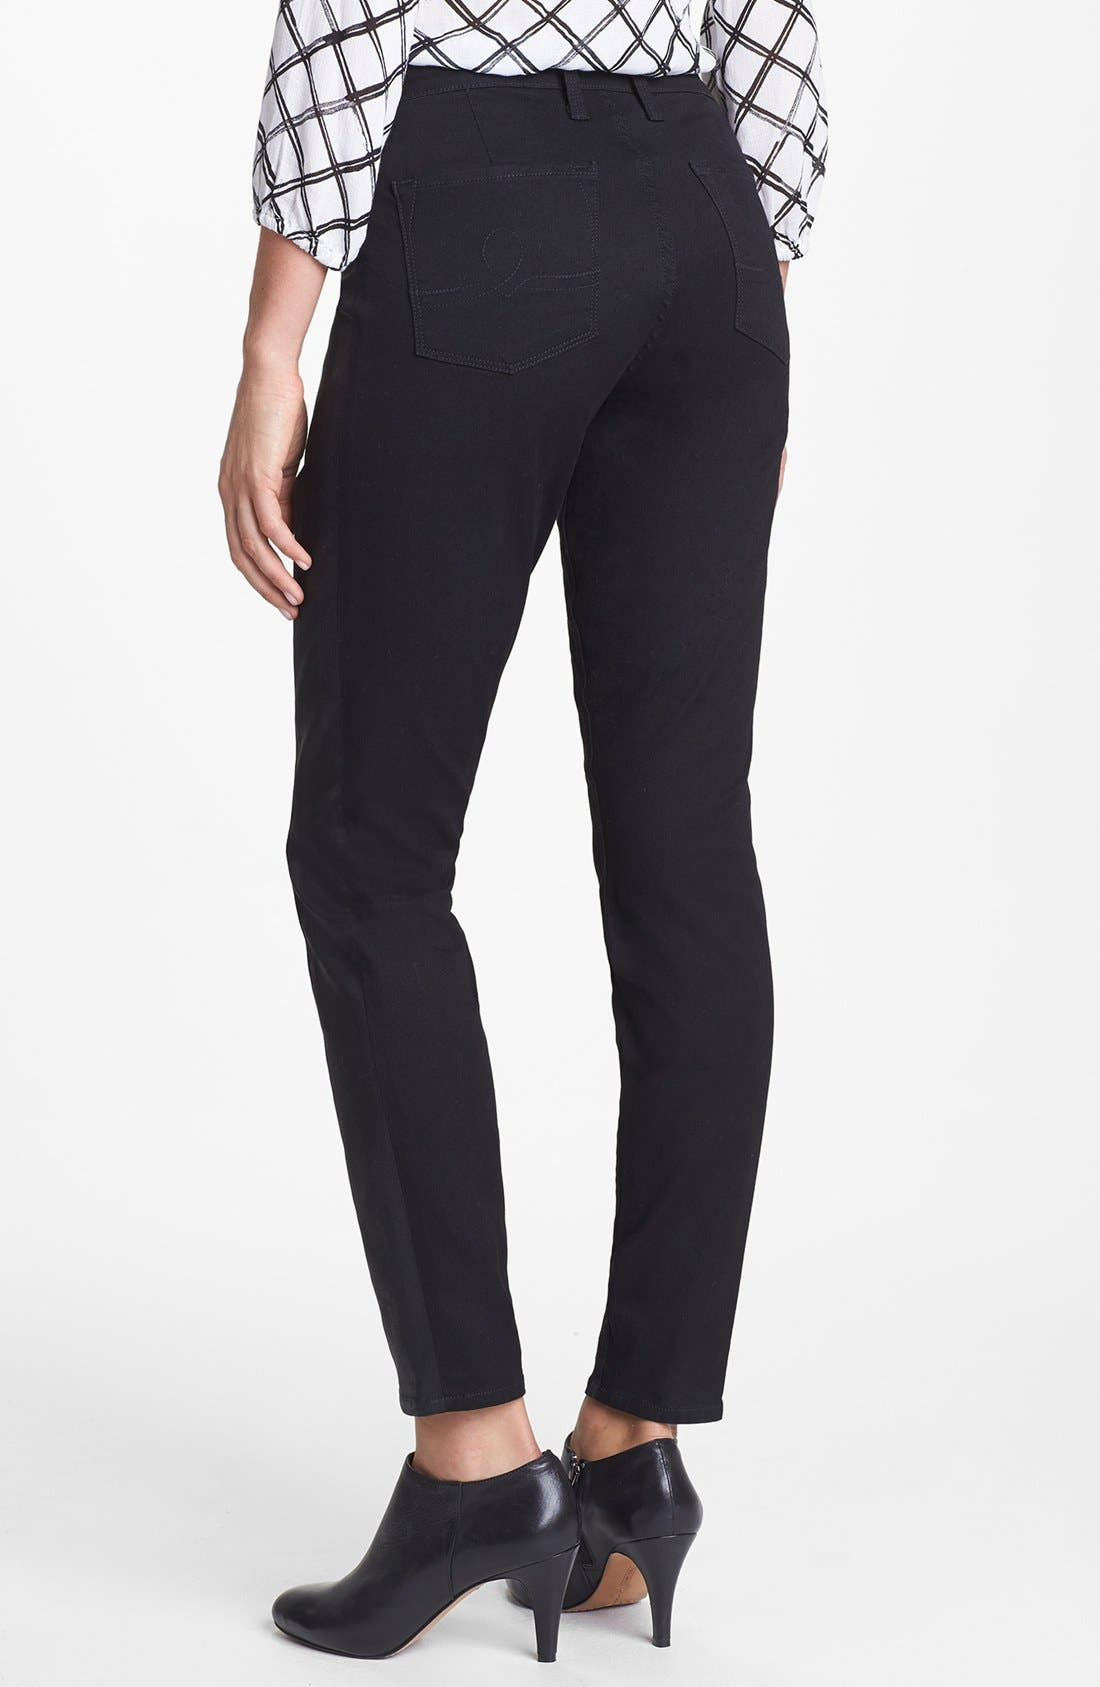 Alternate Image 2  - Lucky Brand 'Sofia' Tuxedo Detail Skinny Jeans (Jededia)